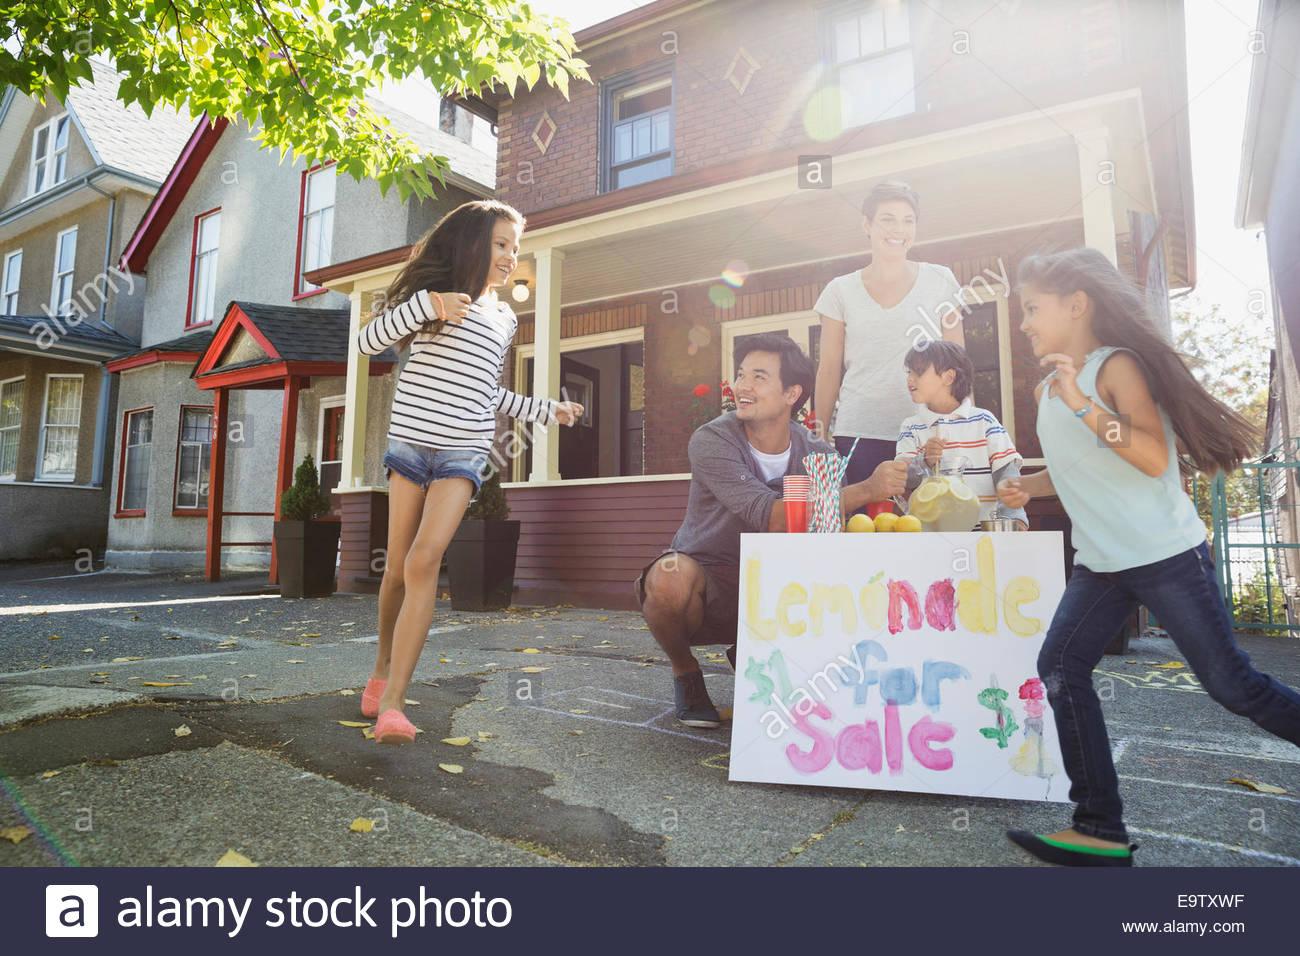 Family at lemonade stand on sidewalk outside house - Stock Image